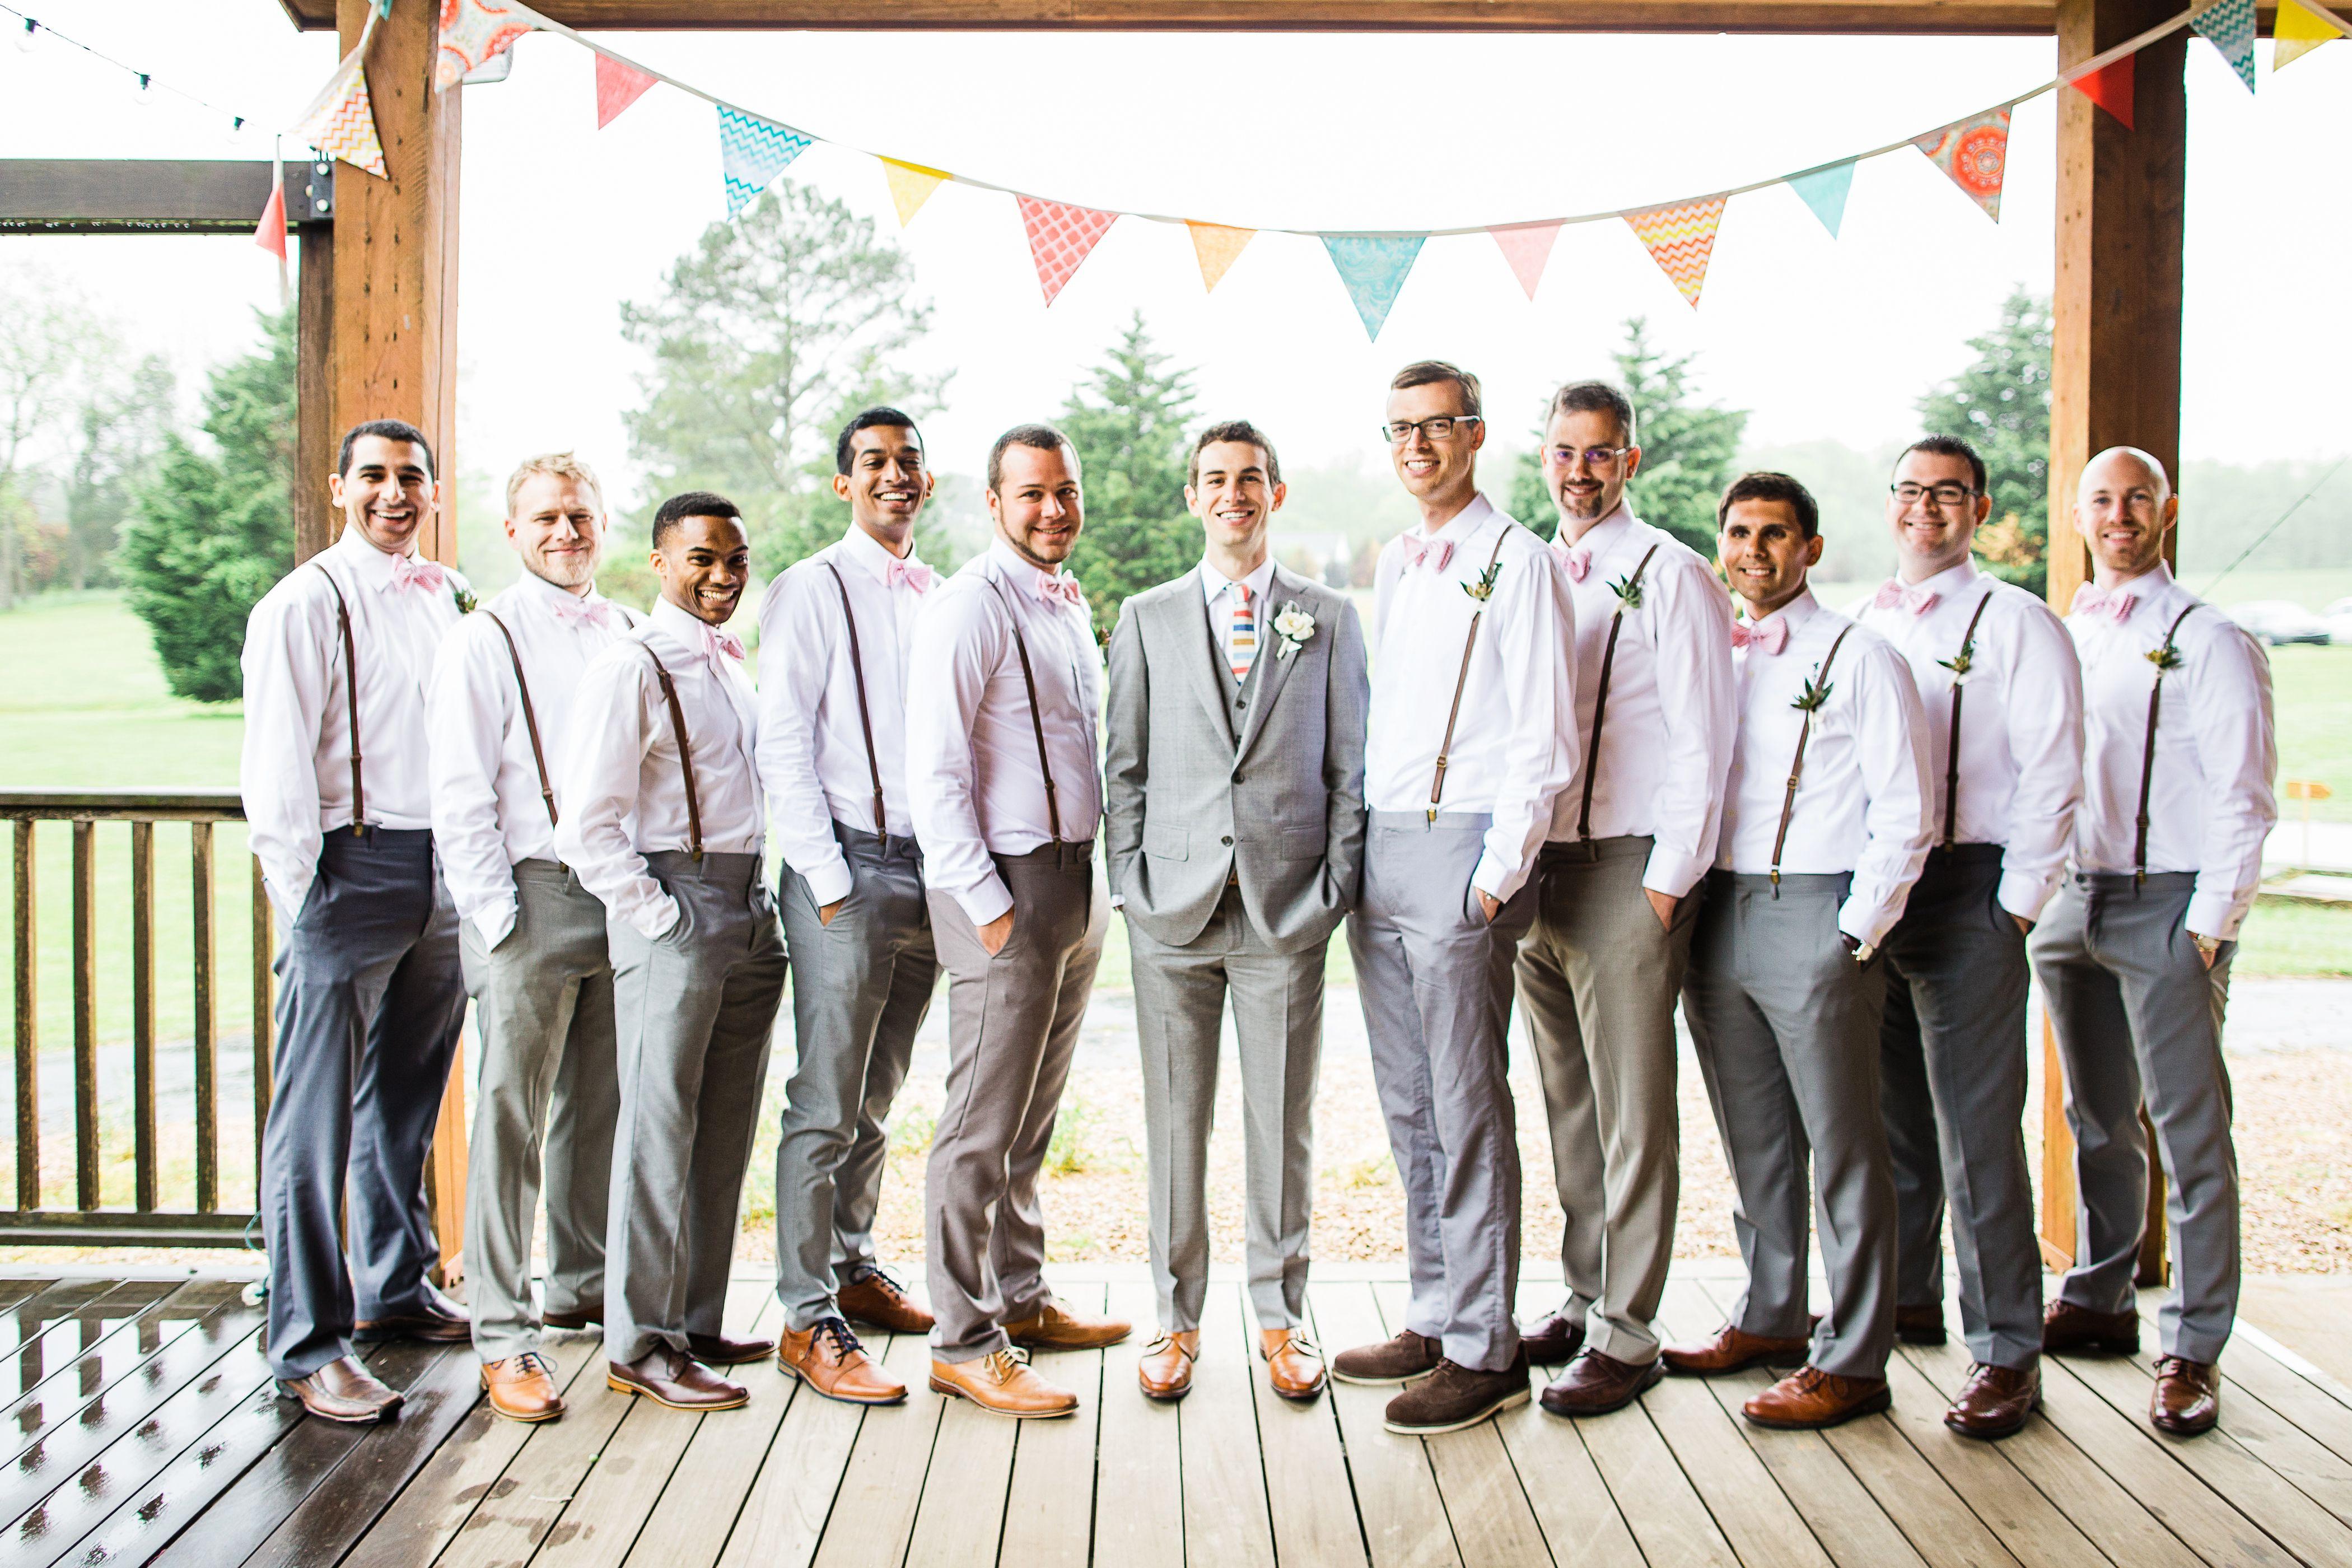 gray pants leather suspenders groomsmen attire